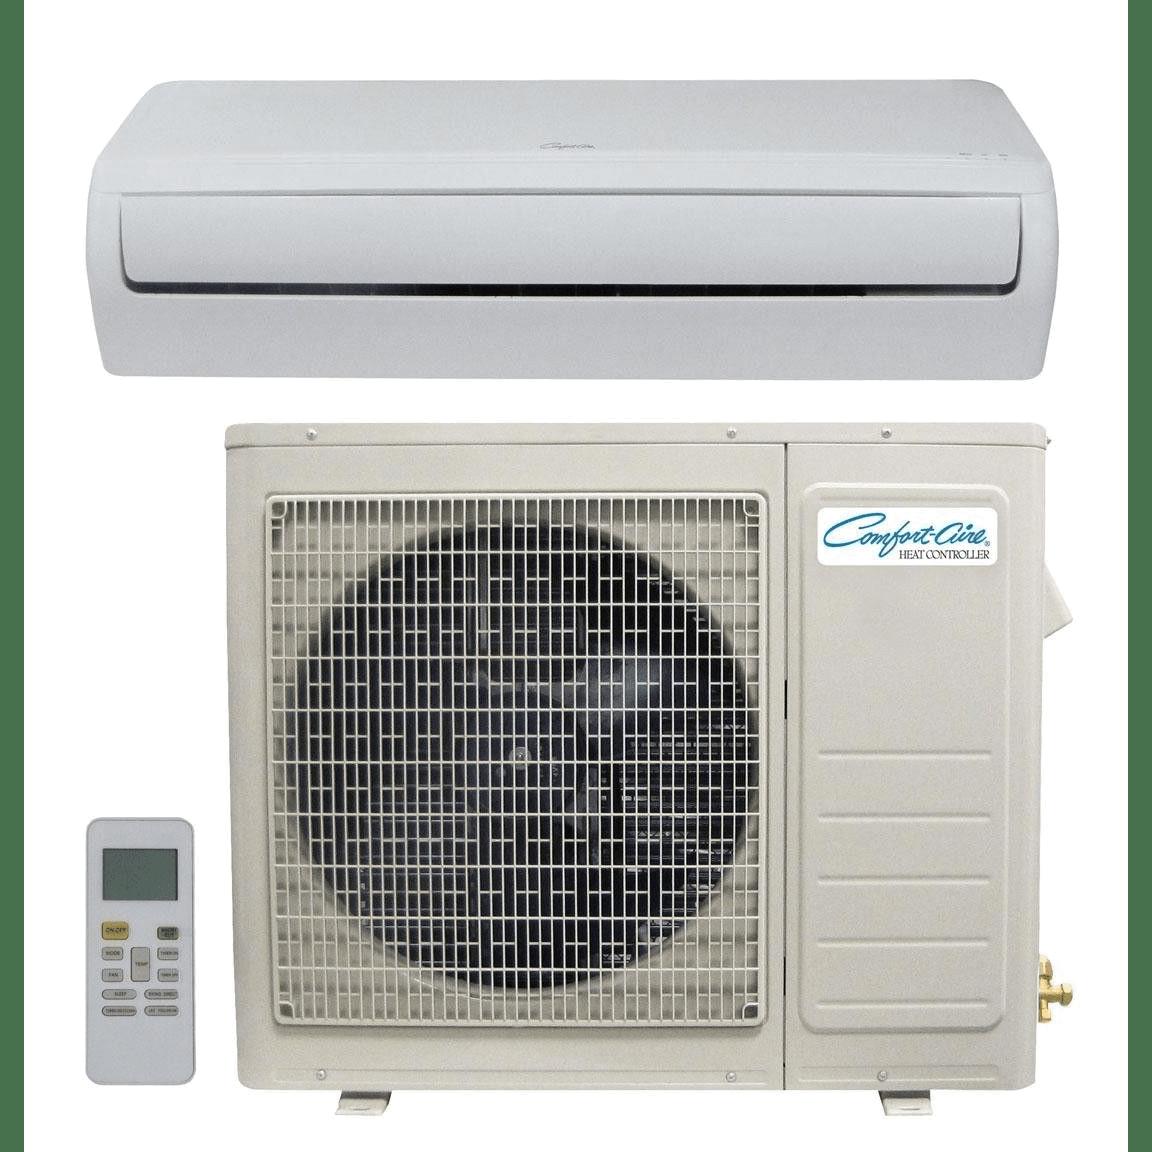 Comfort-Aire DV Series 12,000 BTU Mini Split System co3775k